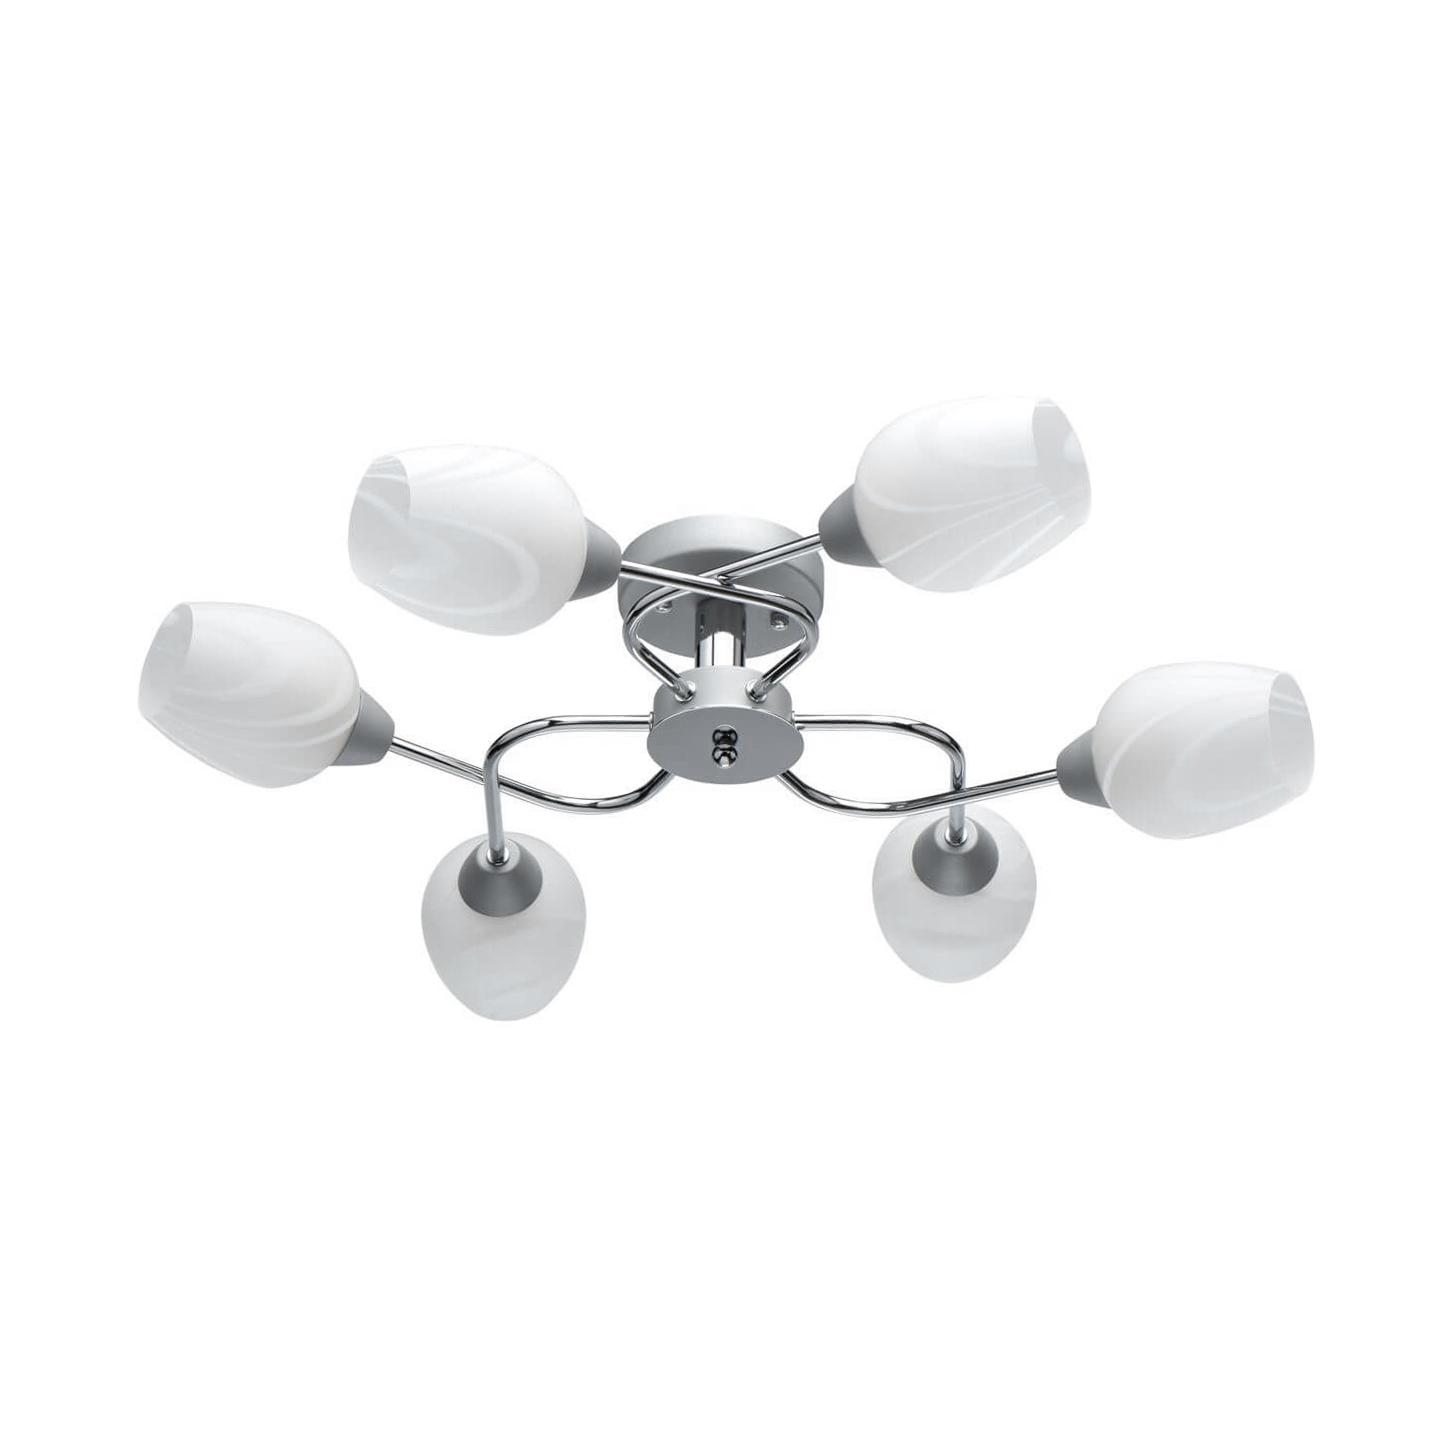 Потолочная люстра MW-Light Олимпия 638018506 люстра потолочная mw light букет 421013406 6 40 w е14 220 v